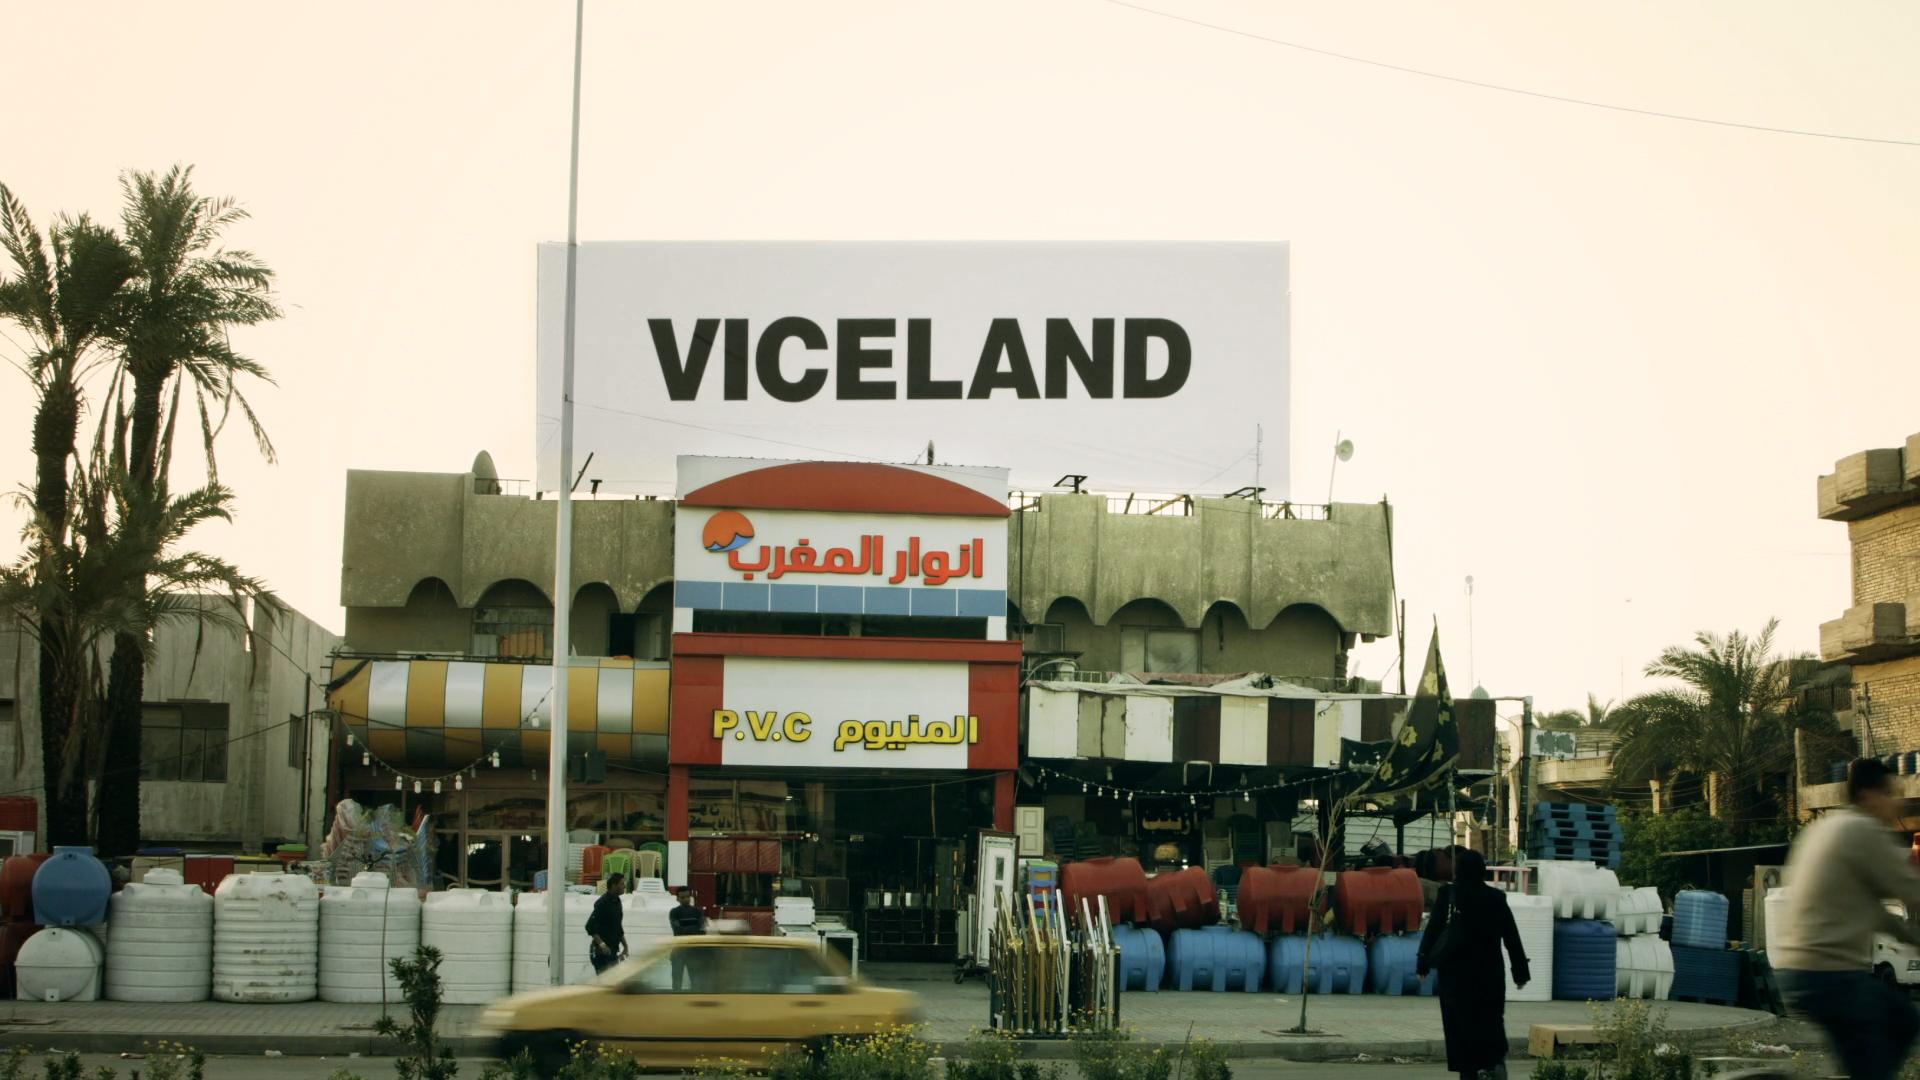 Viceland_The_Unbrand_10.jpg